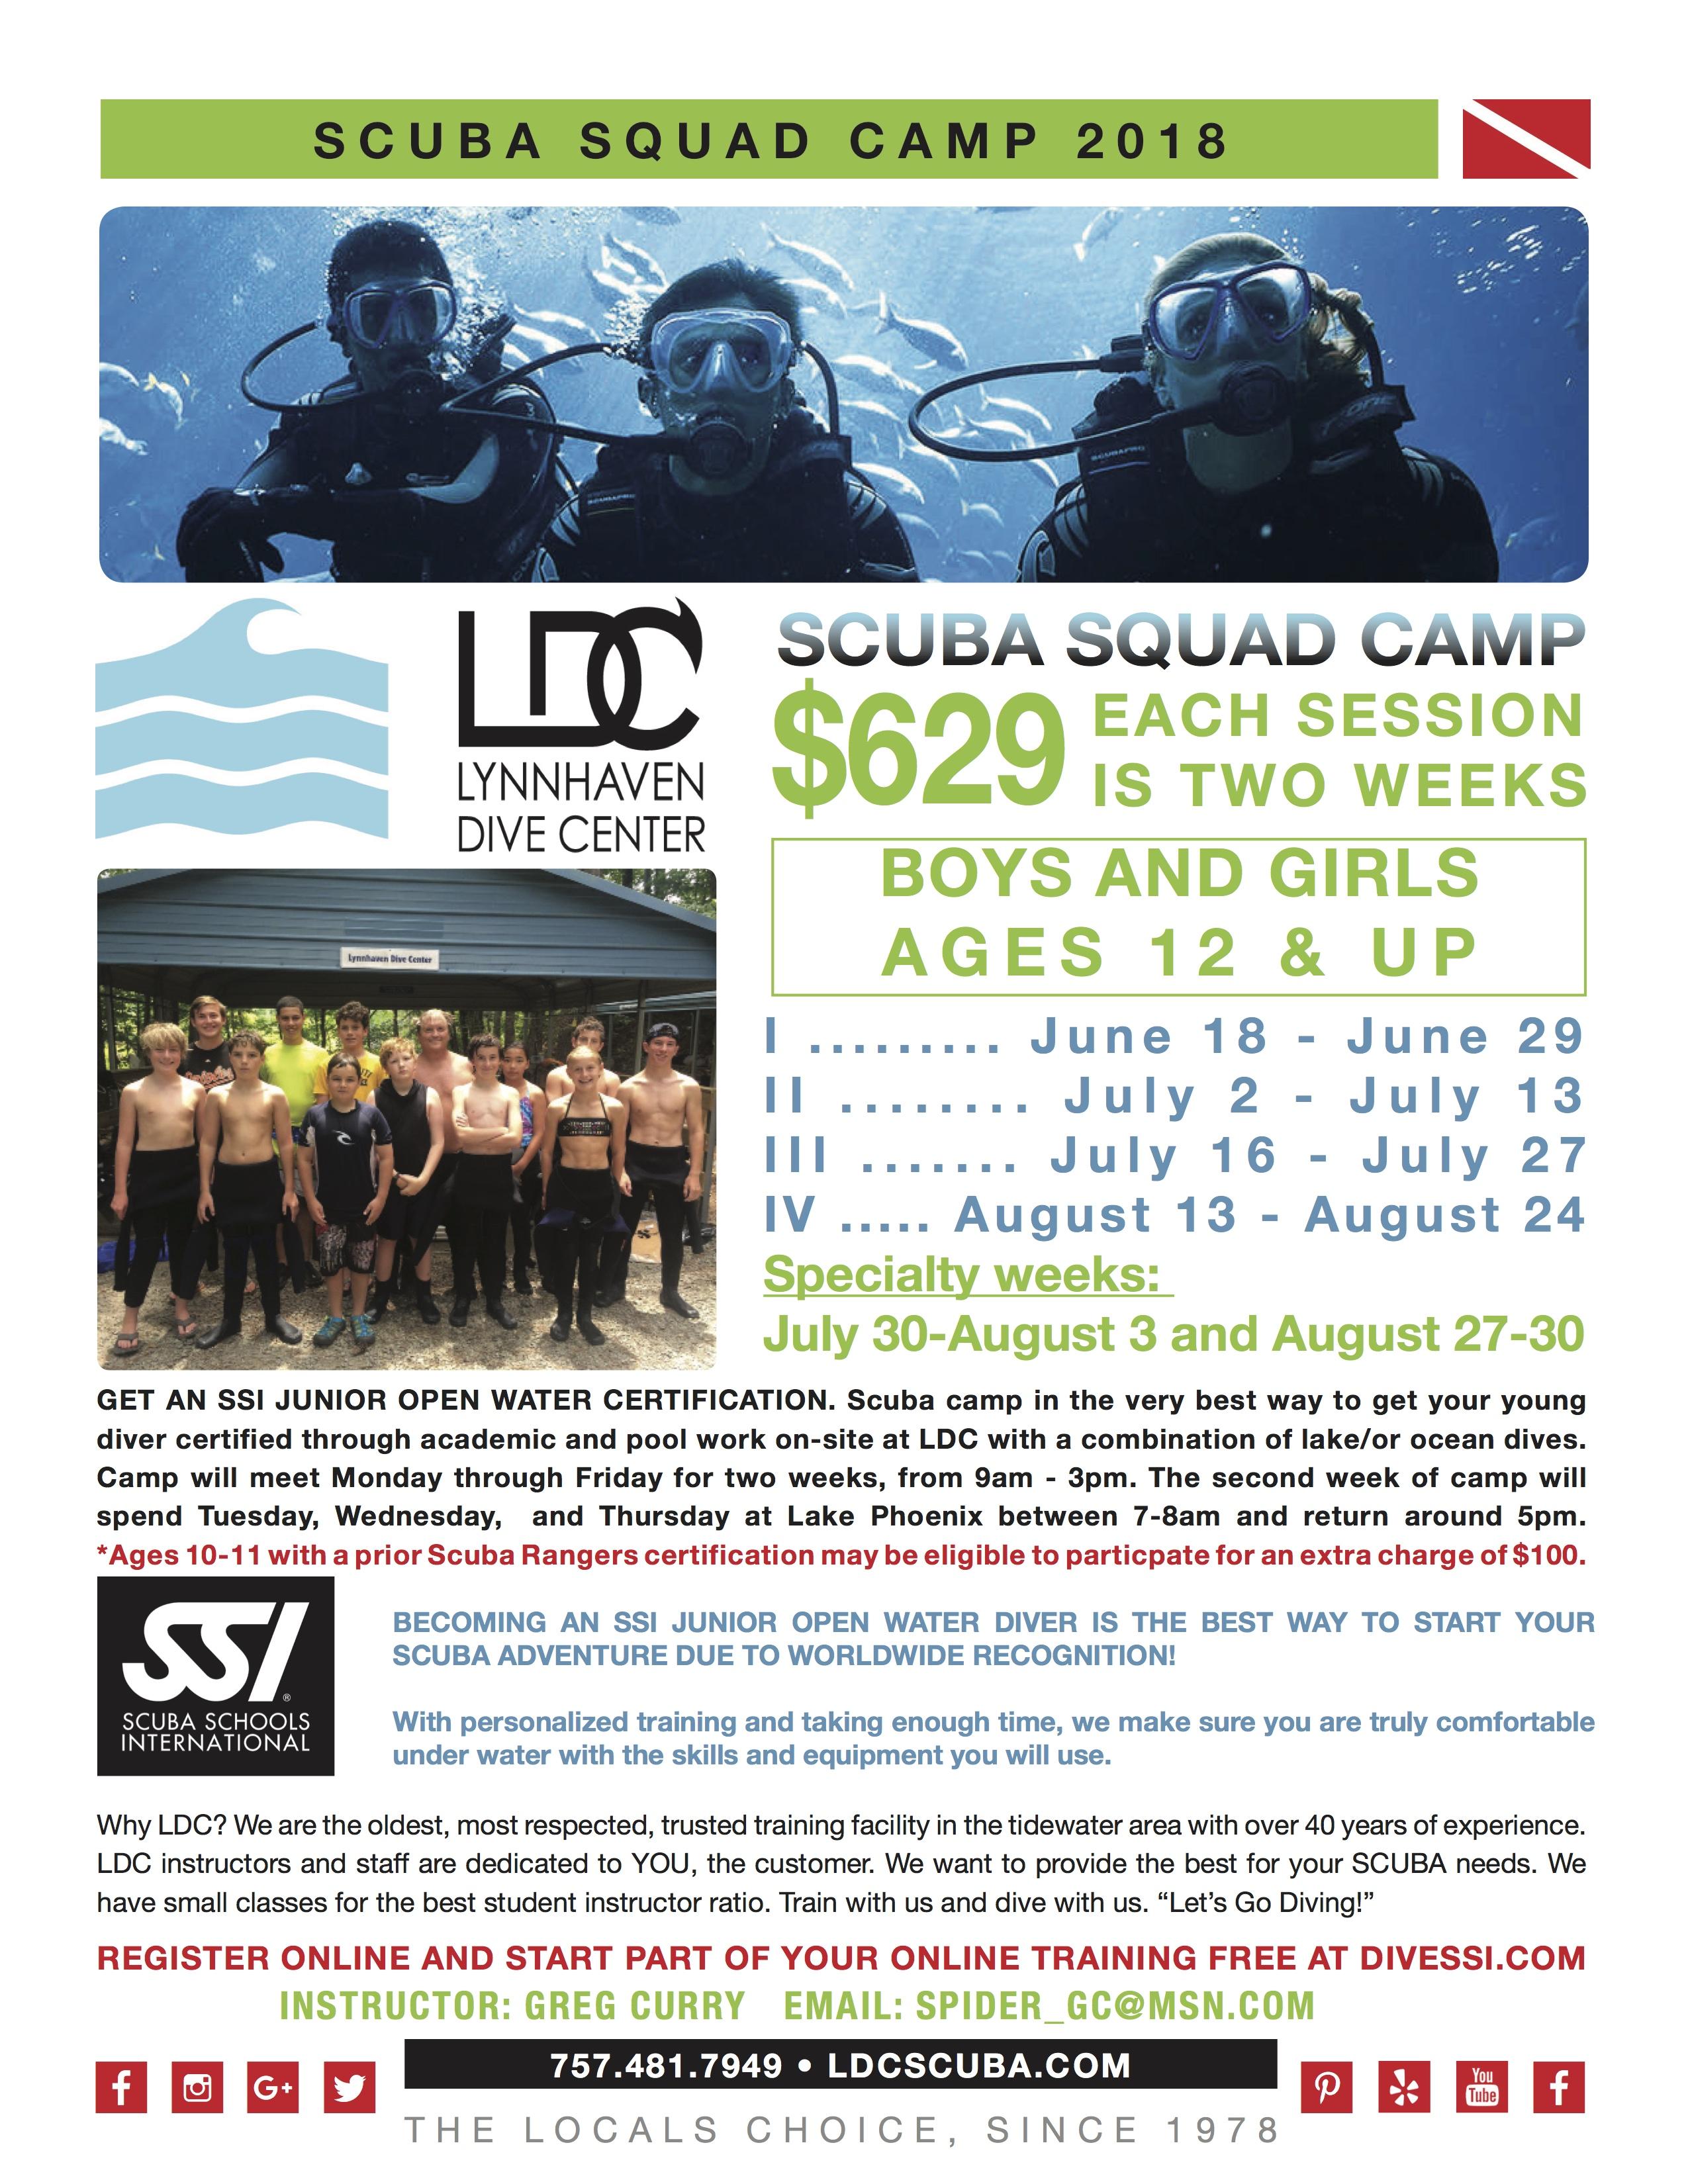 Summer Camps Lynnhaven Dive Center